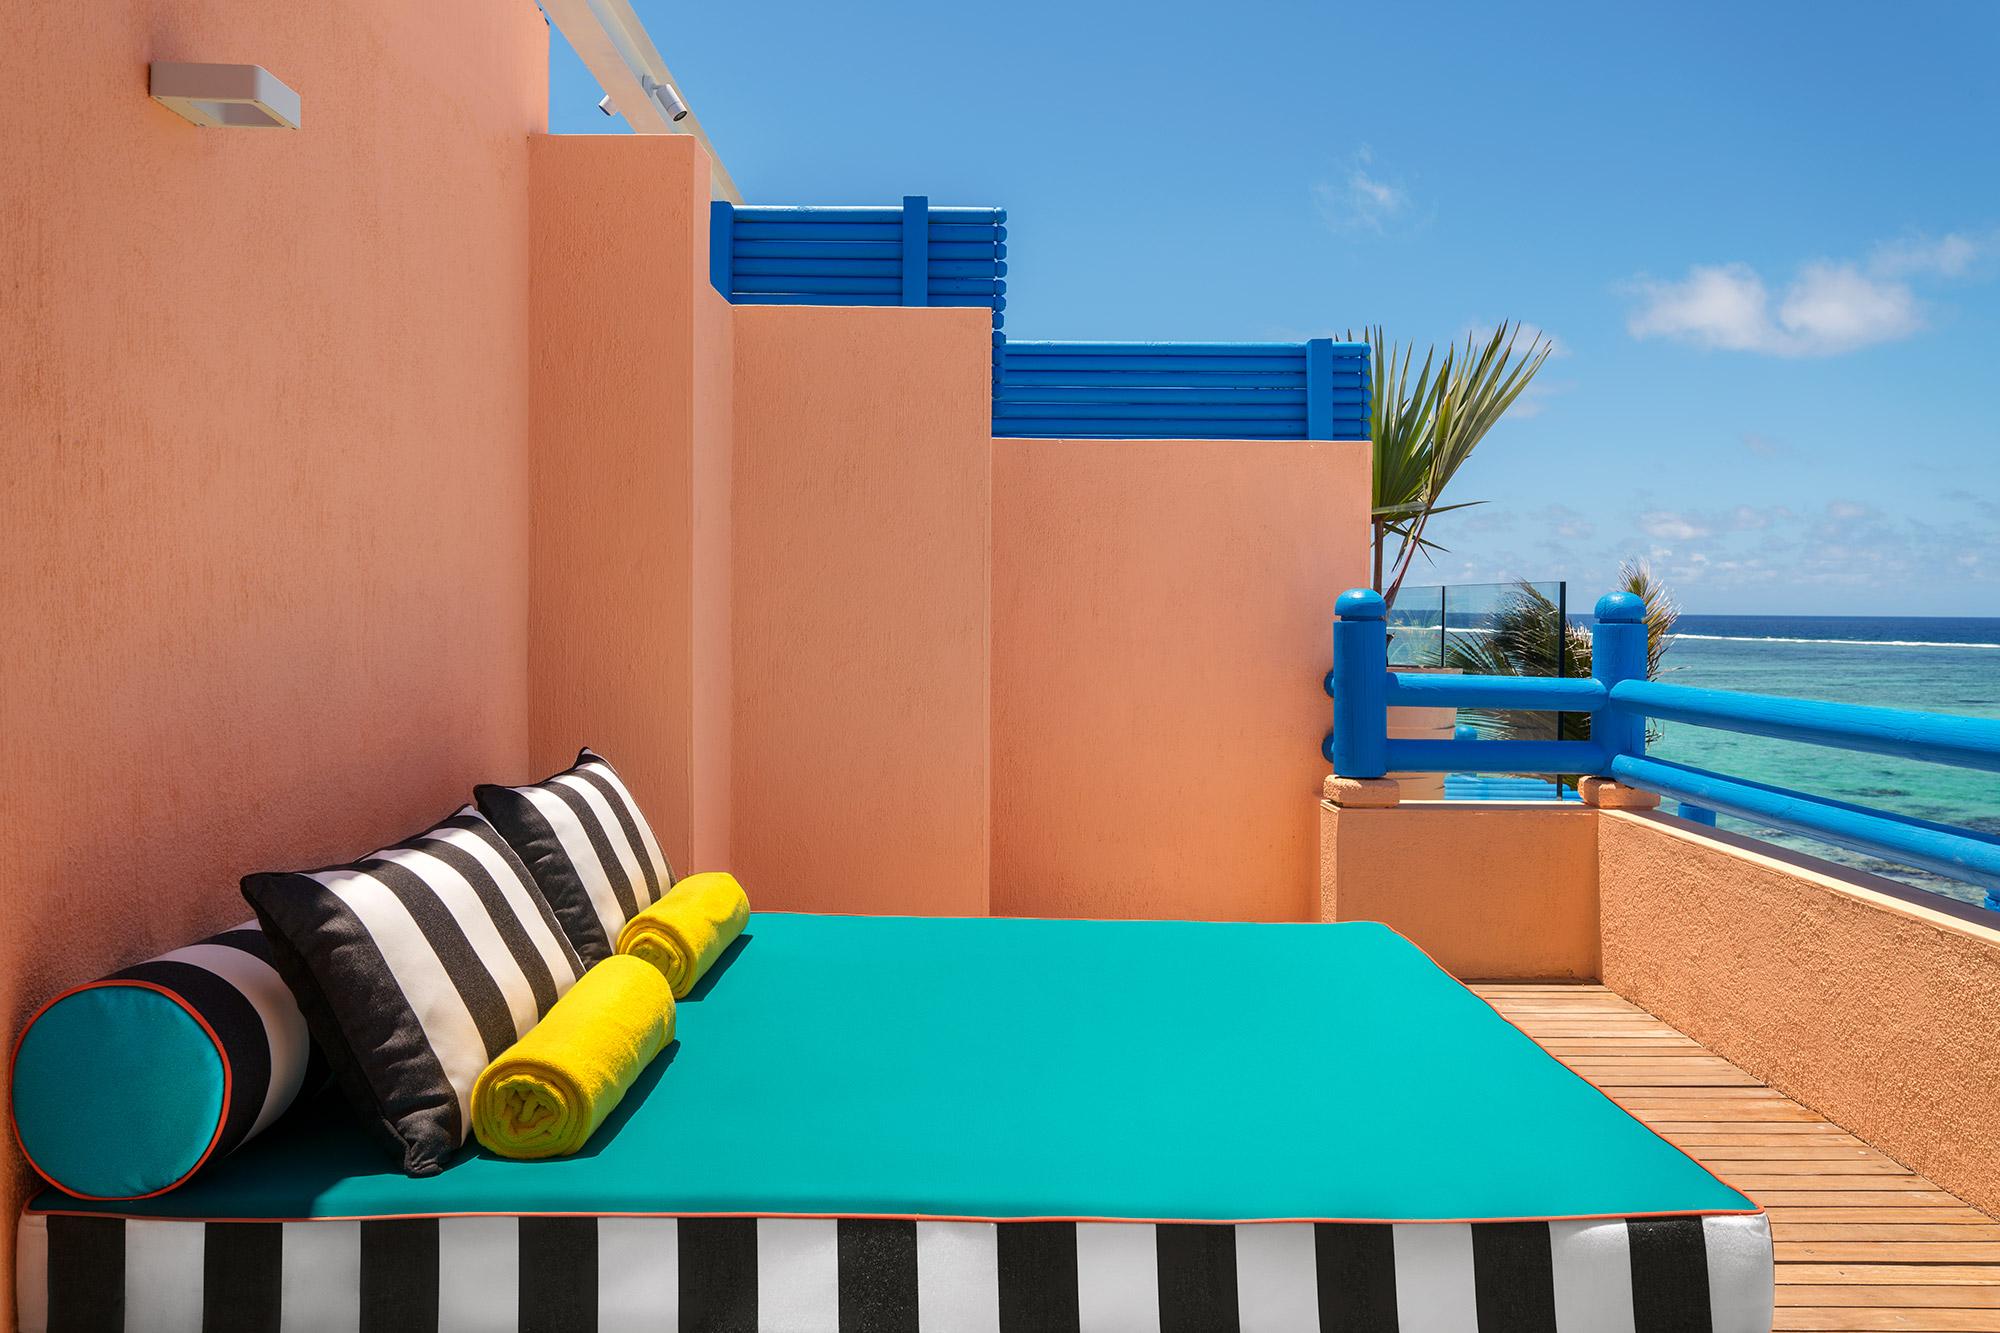 salt-palmar-hotel-mauritius_866.jpg